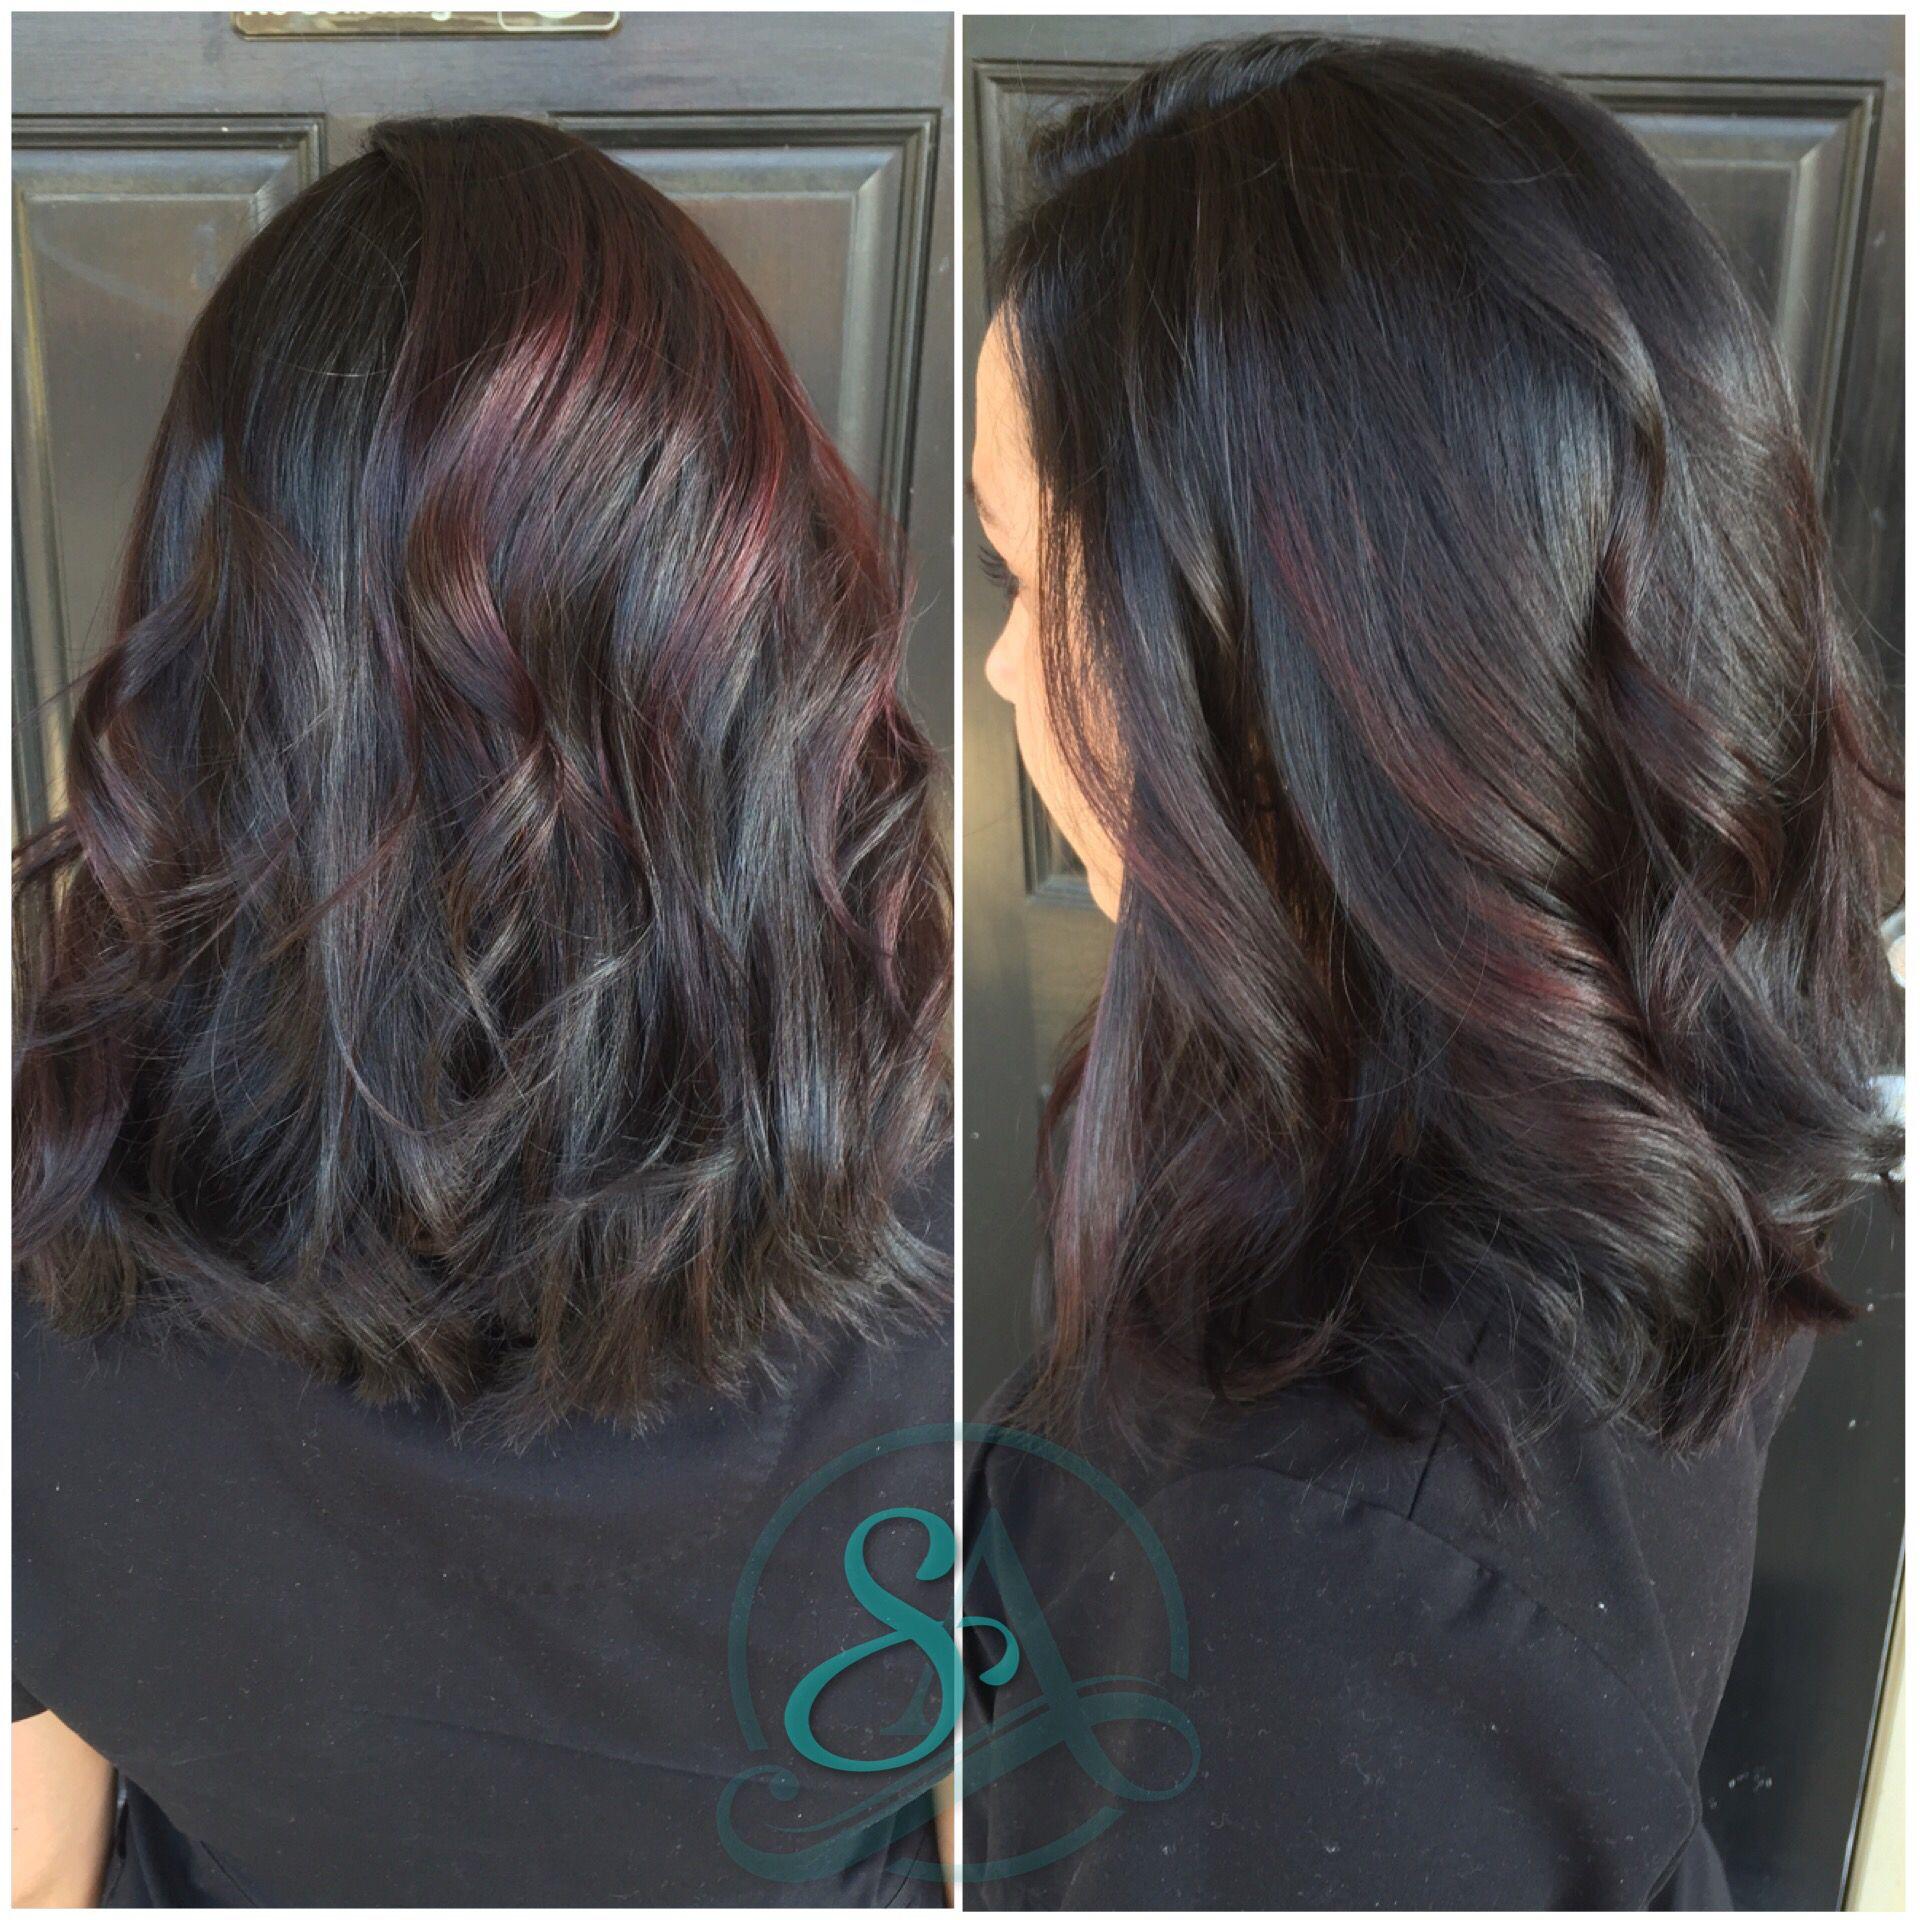 Violet Balayage For Fall Dark Hair Balayage Medium Length Haircut Dark Brown Hair Balayage Balayage Hair Dark Balayage Hair Dark Brown Hair Balayage